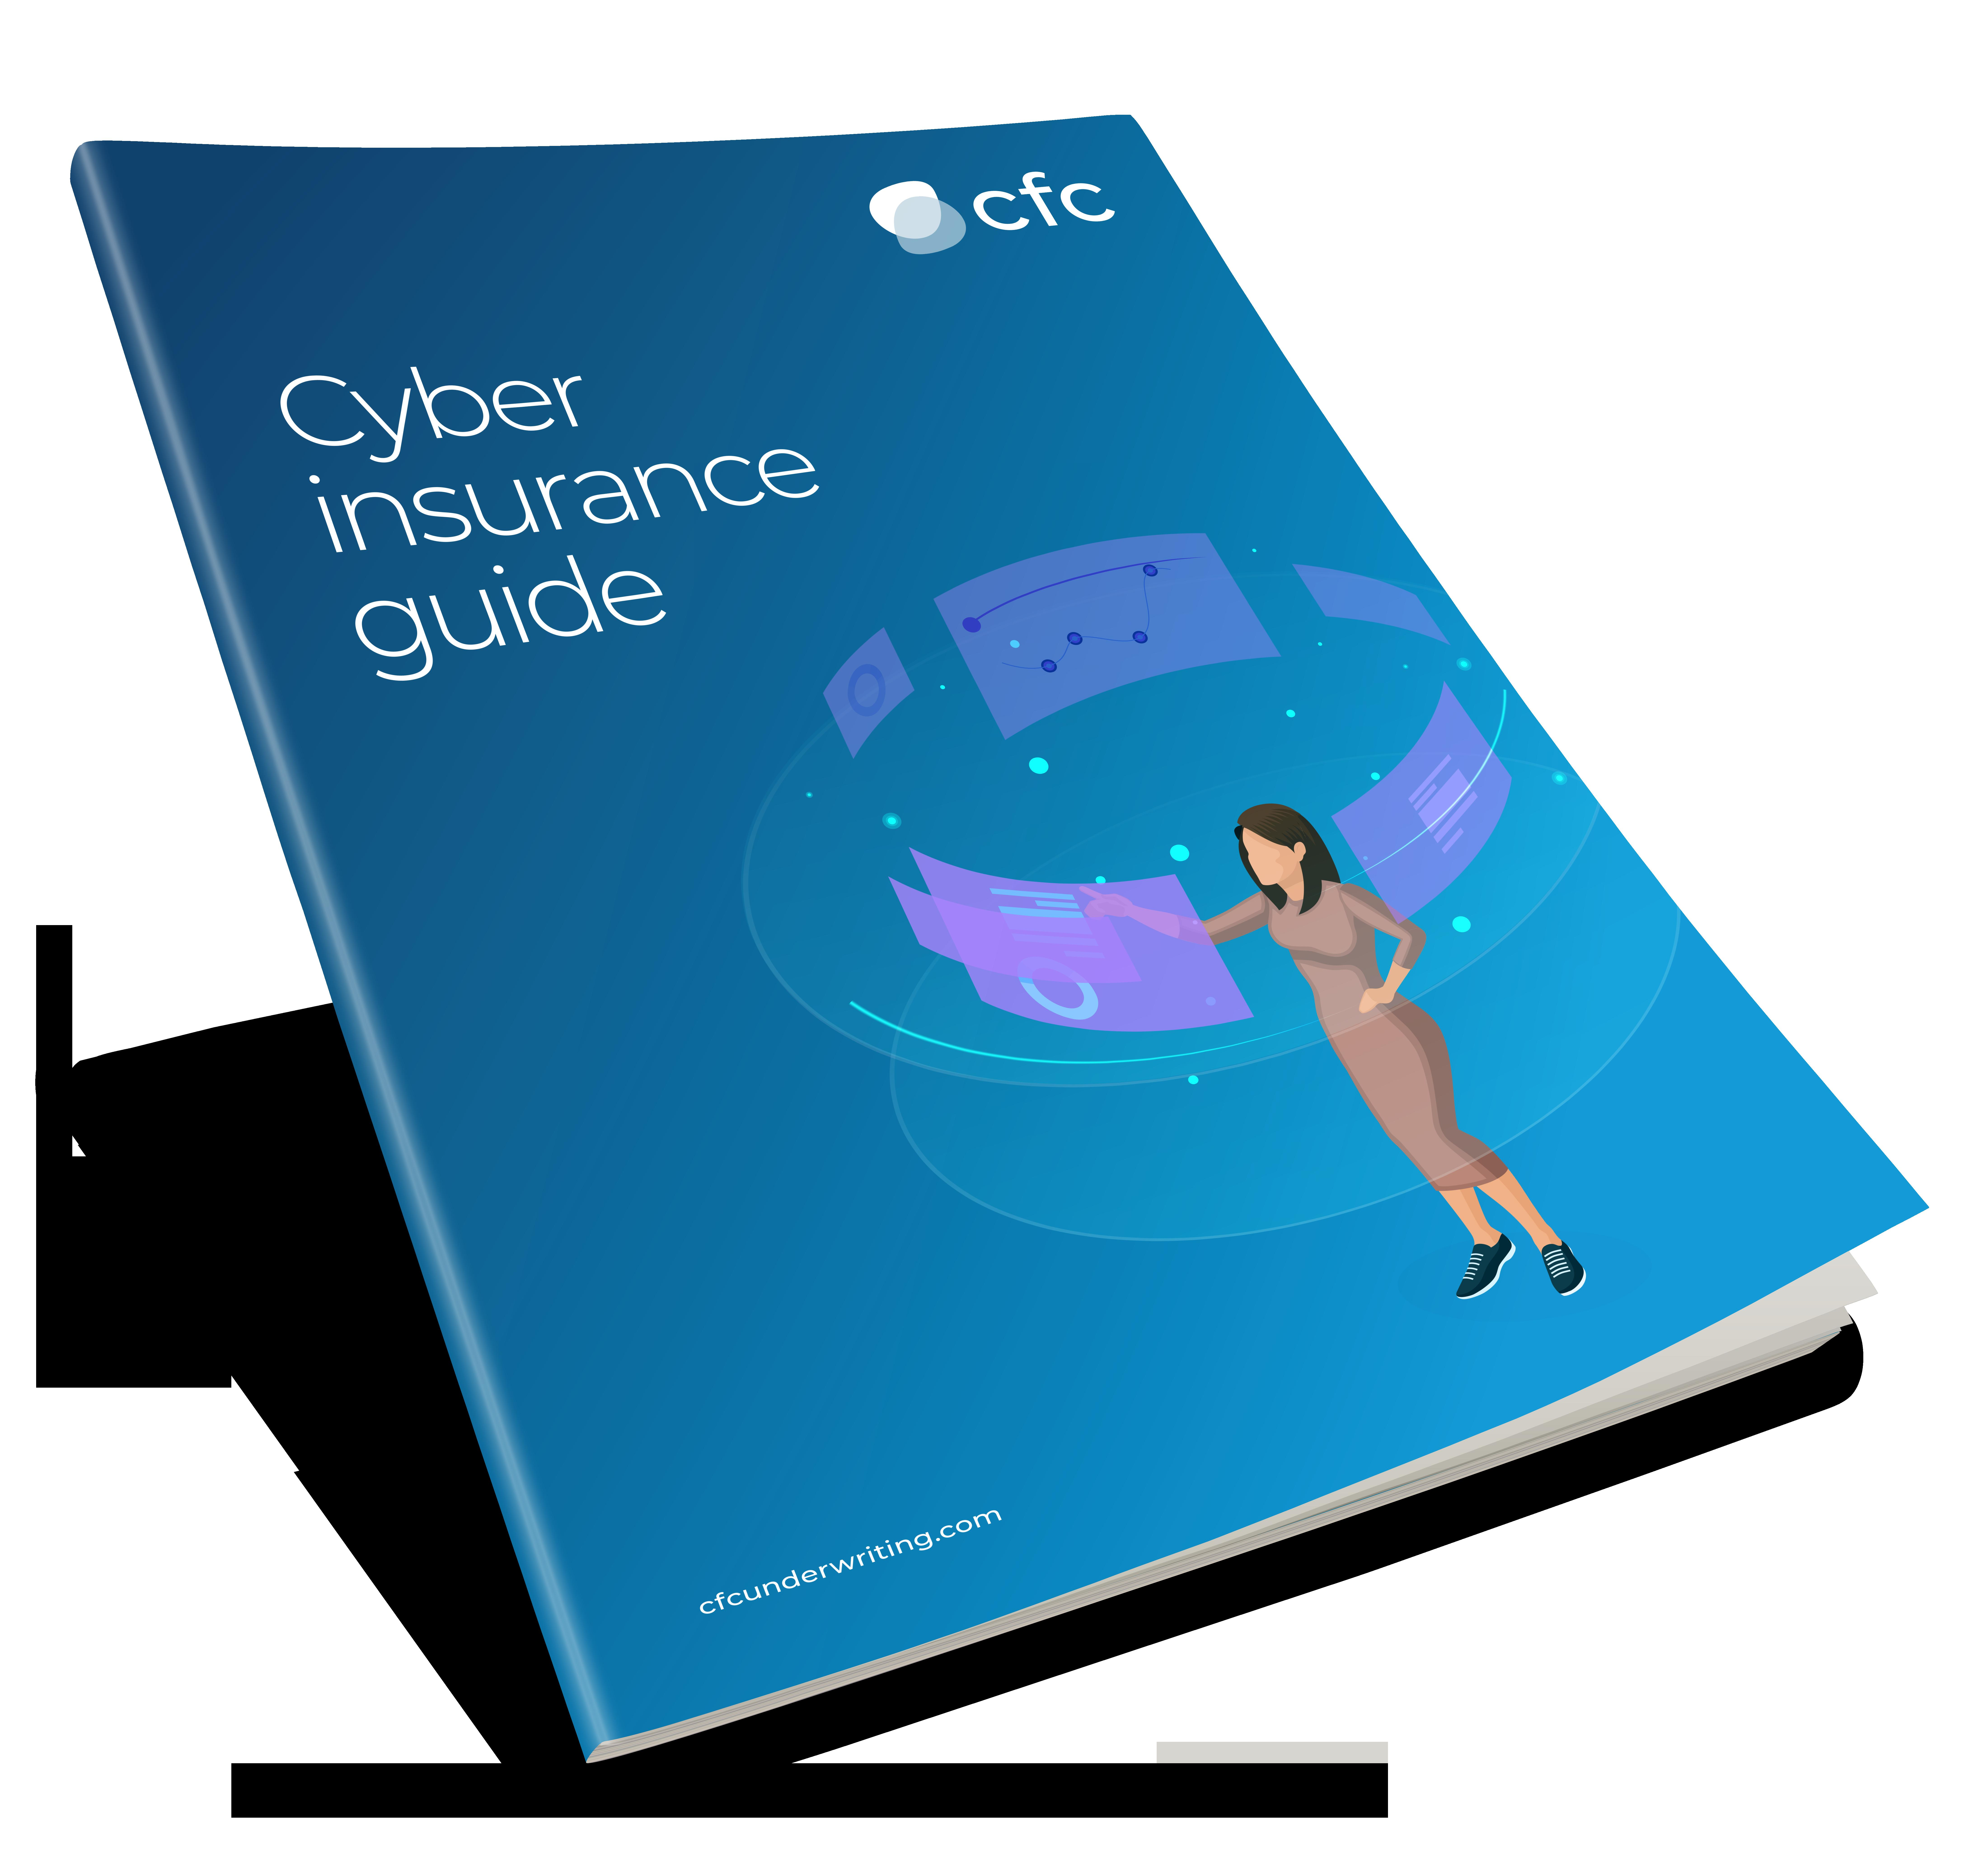 Cyber guide